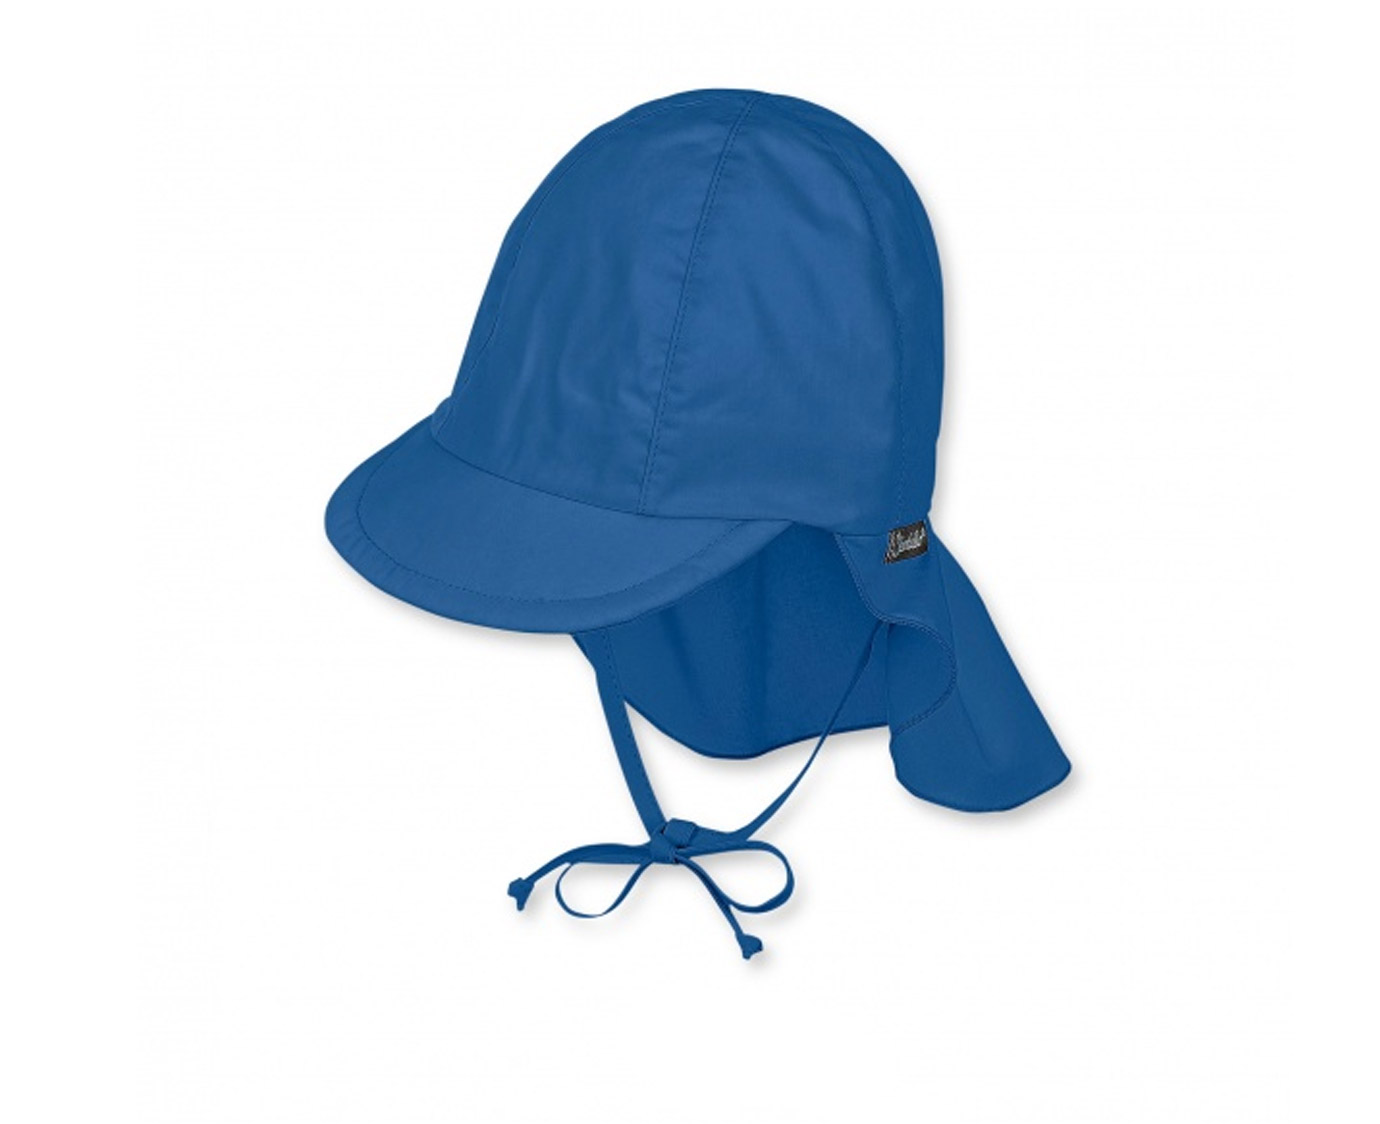 Zonnehoedje 'Joris Blauw' kleur